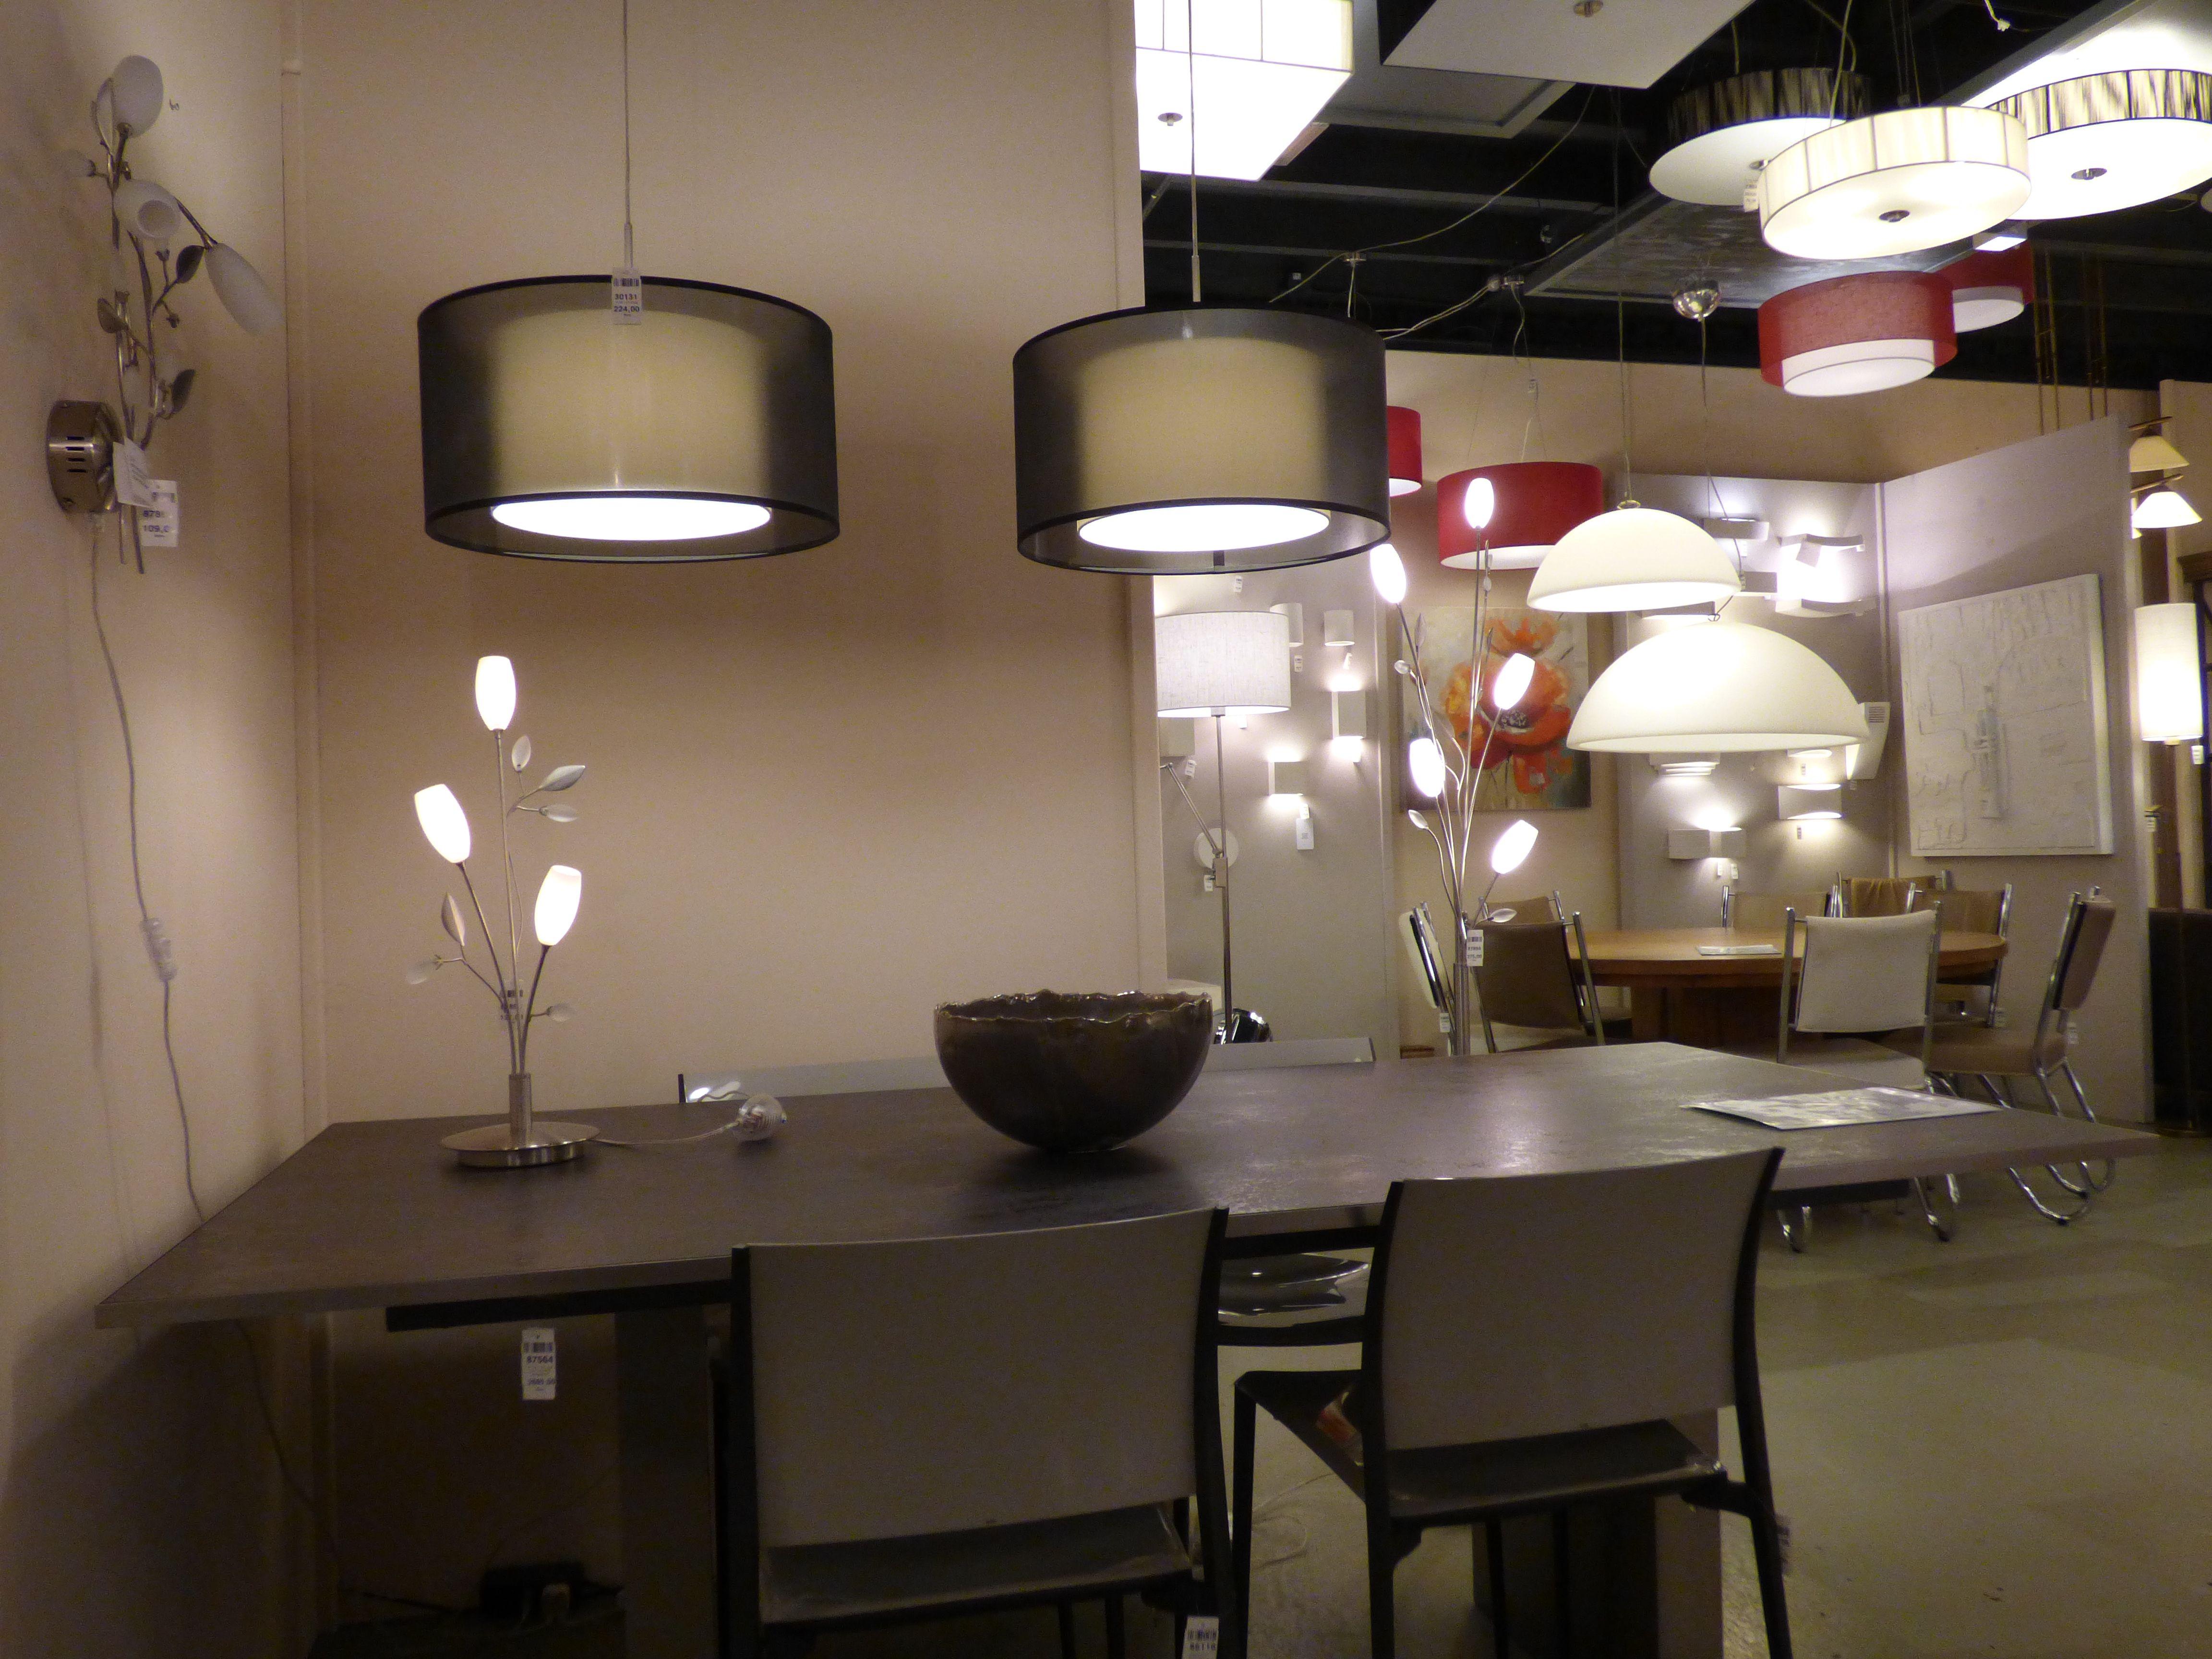 Iluminaci n tienda l mparas para sala decoraci n for Lamparas para salas pequenas